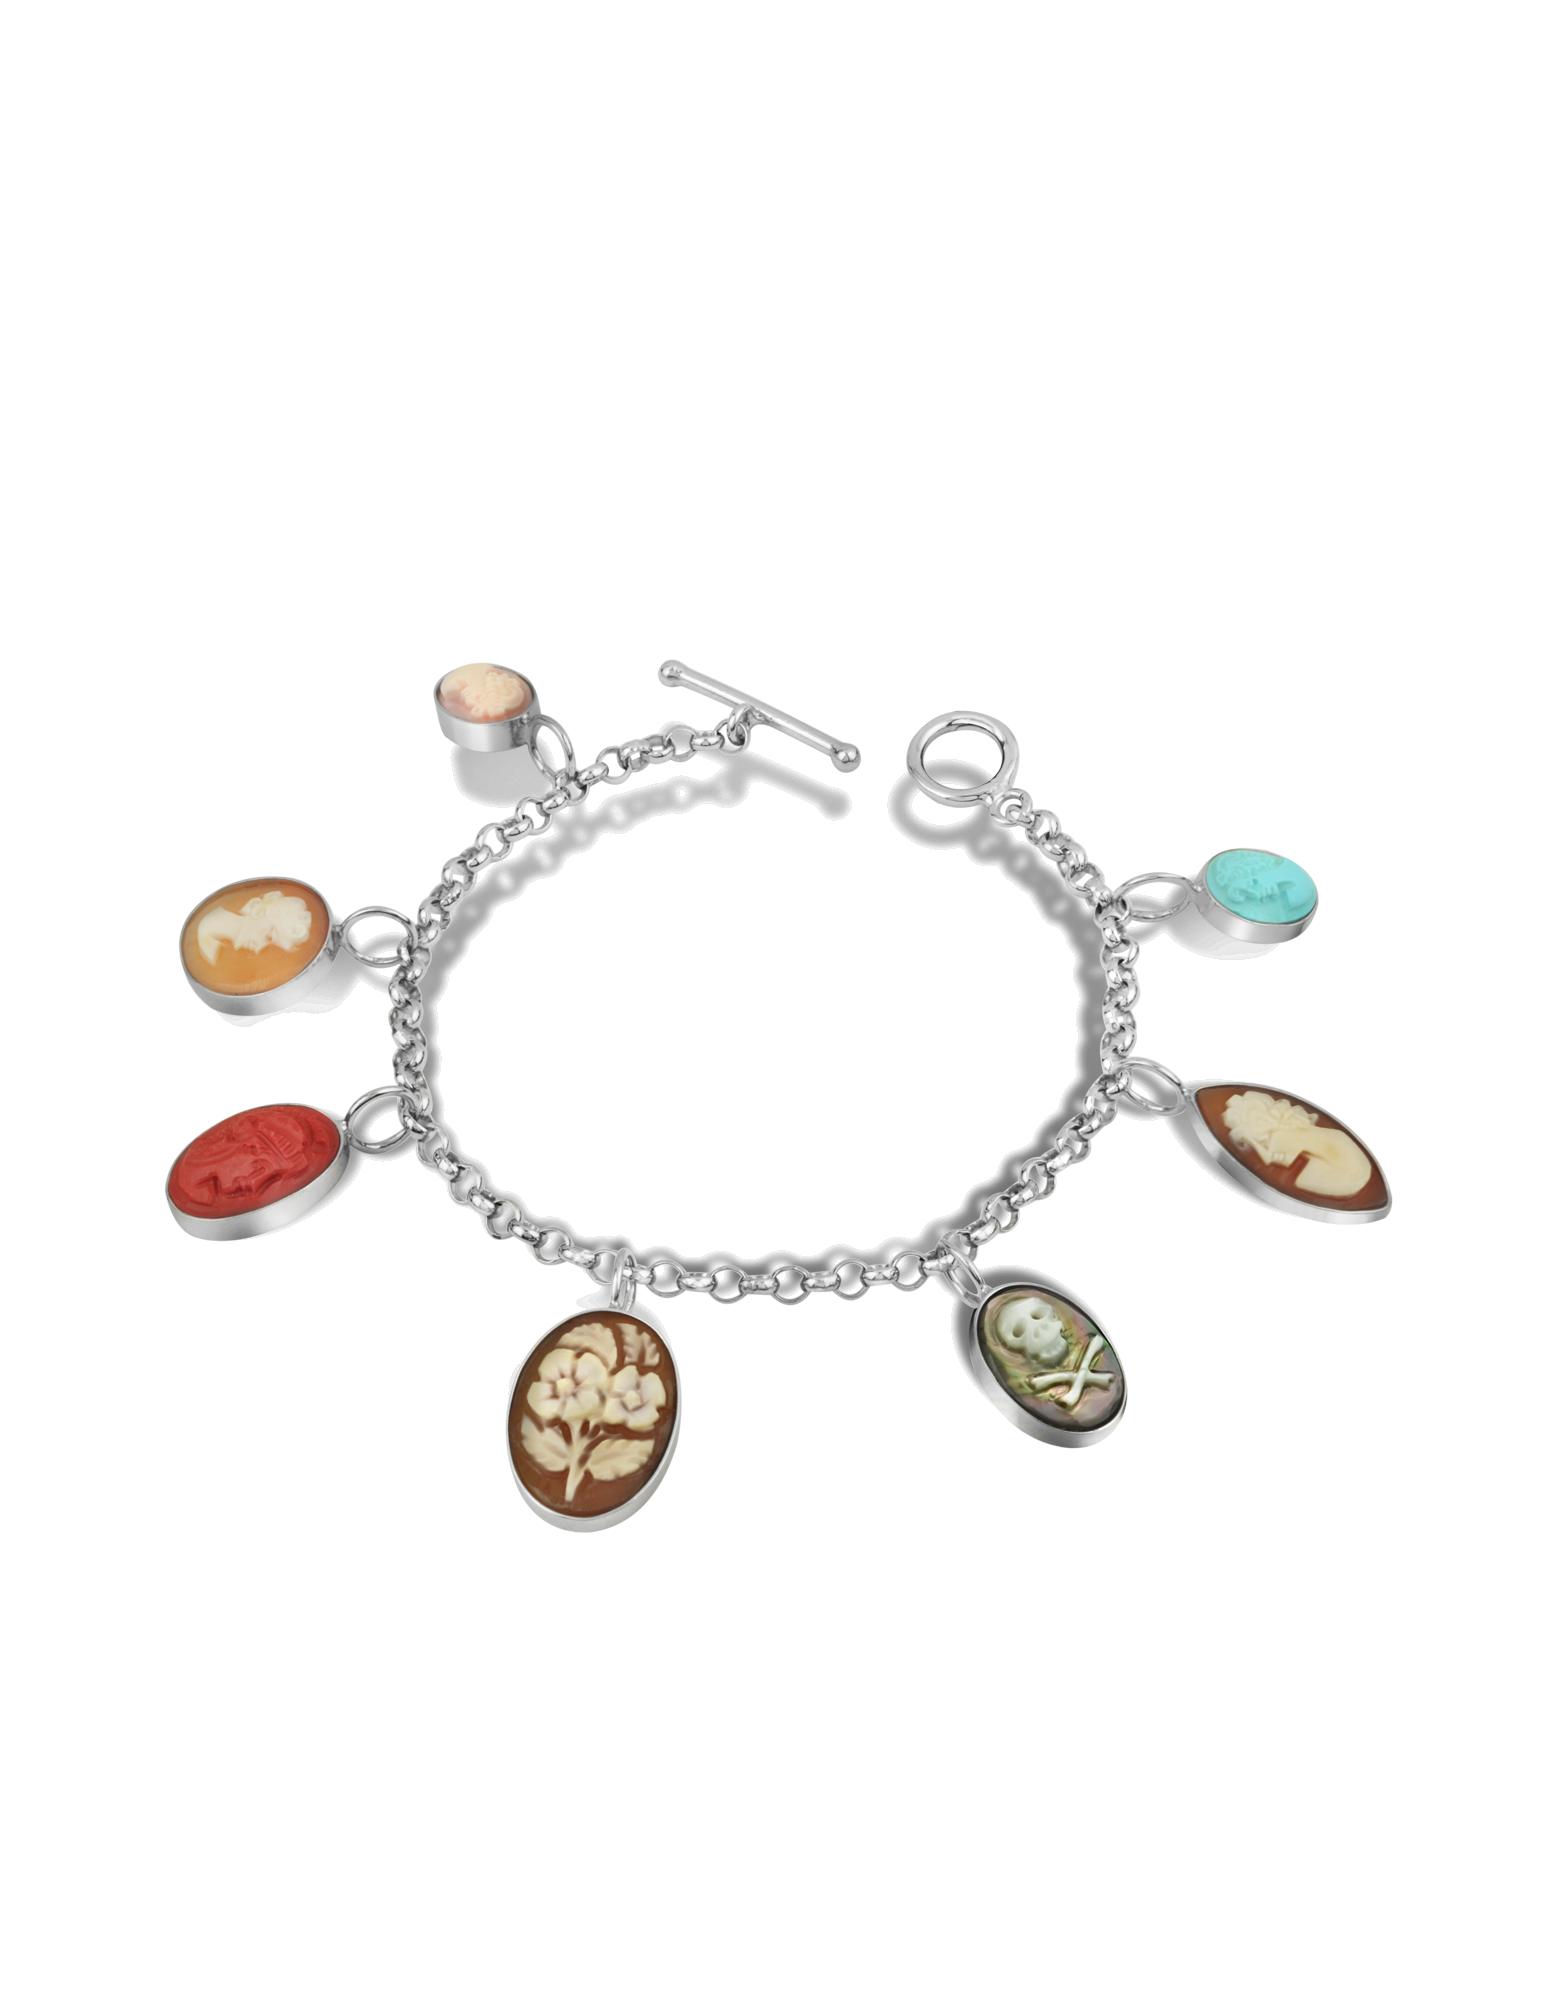 Image of Cameo Charm Bracelet